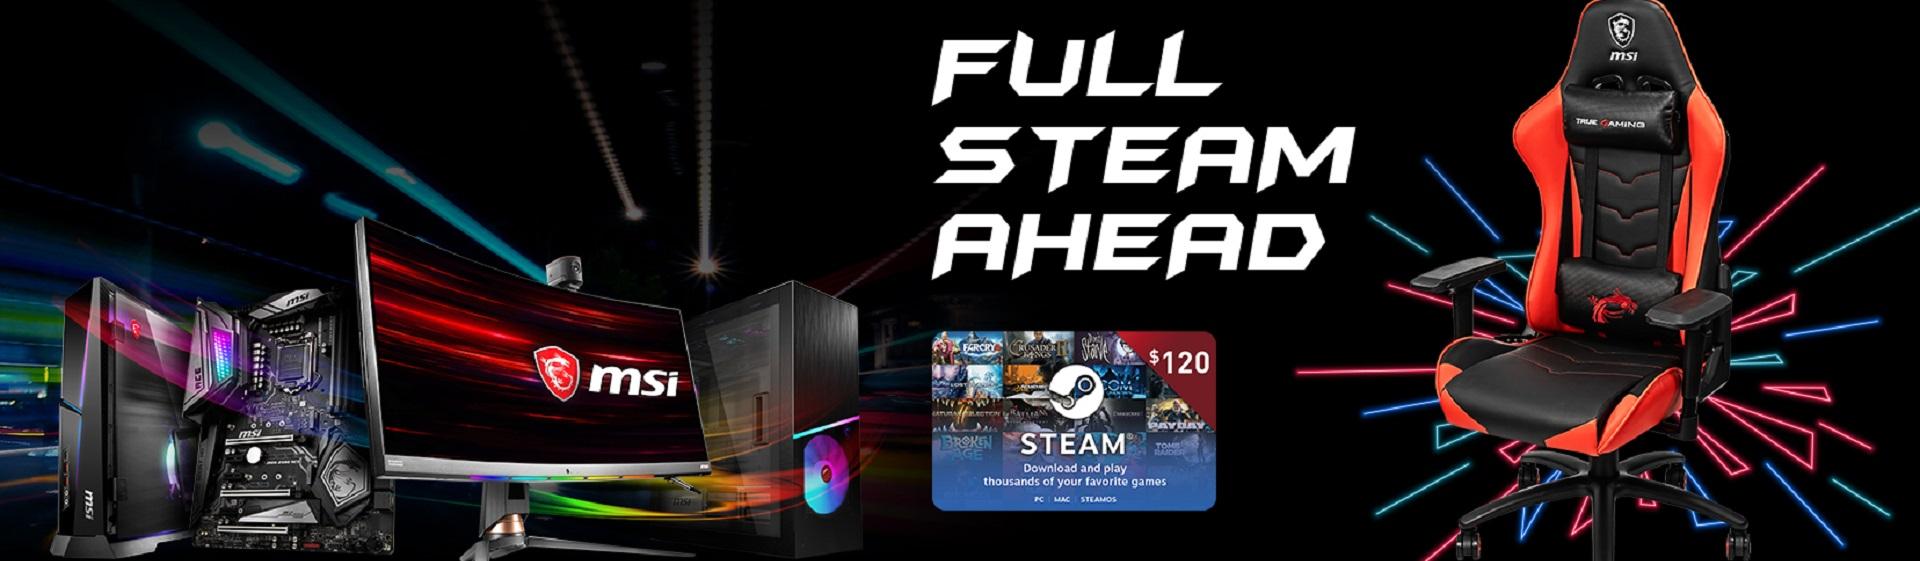 MSI Full Steam Ahead